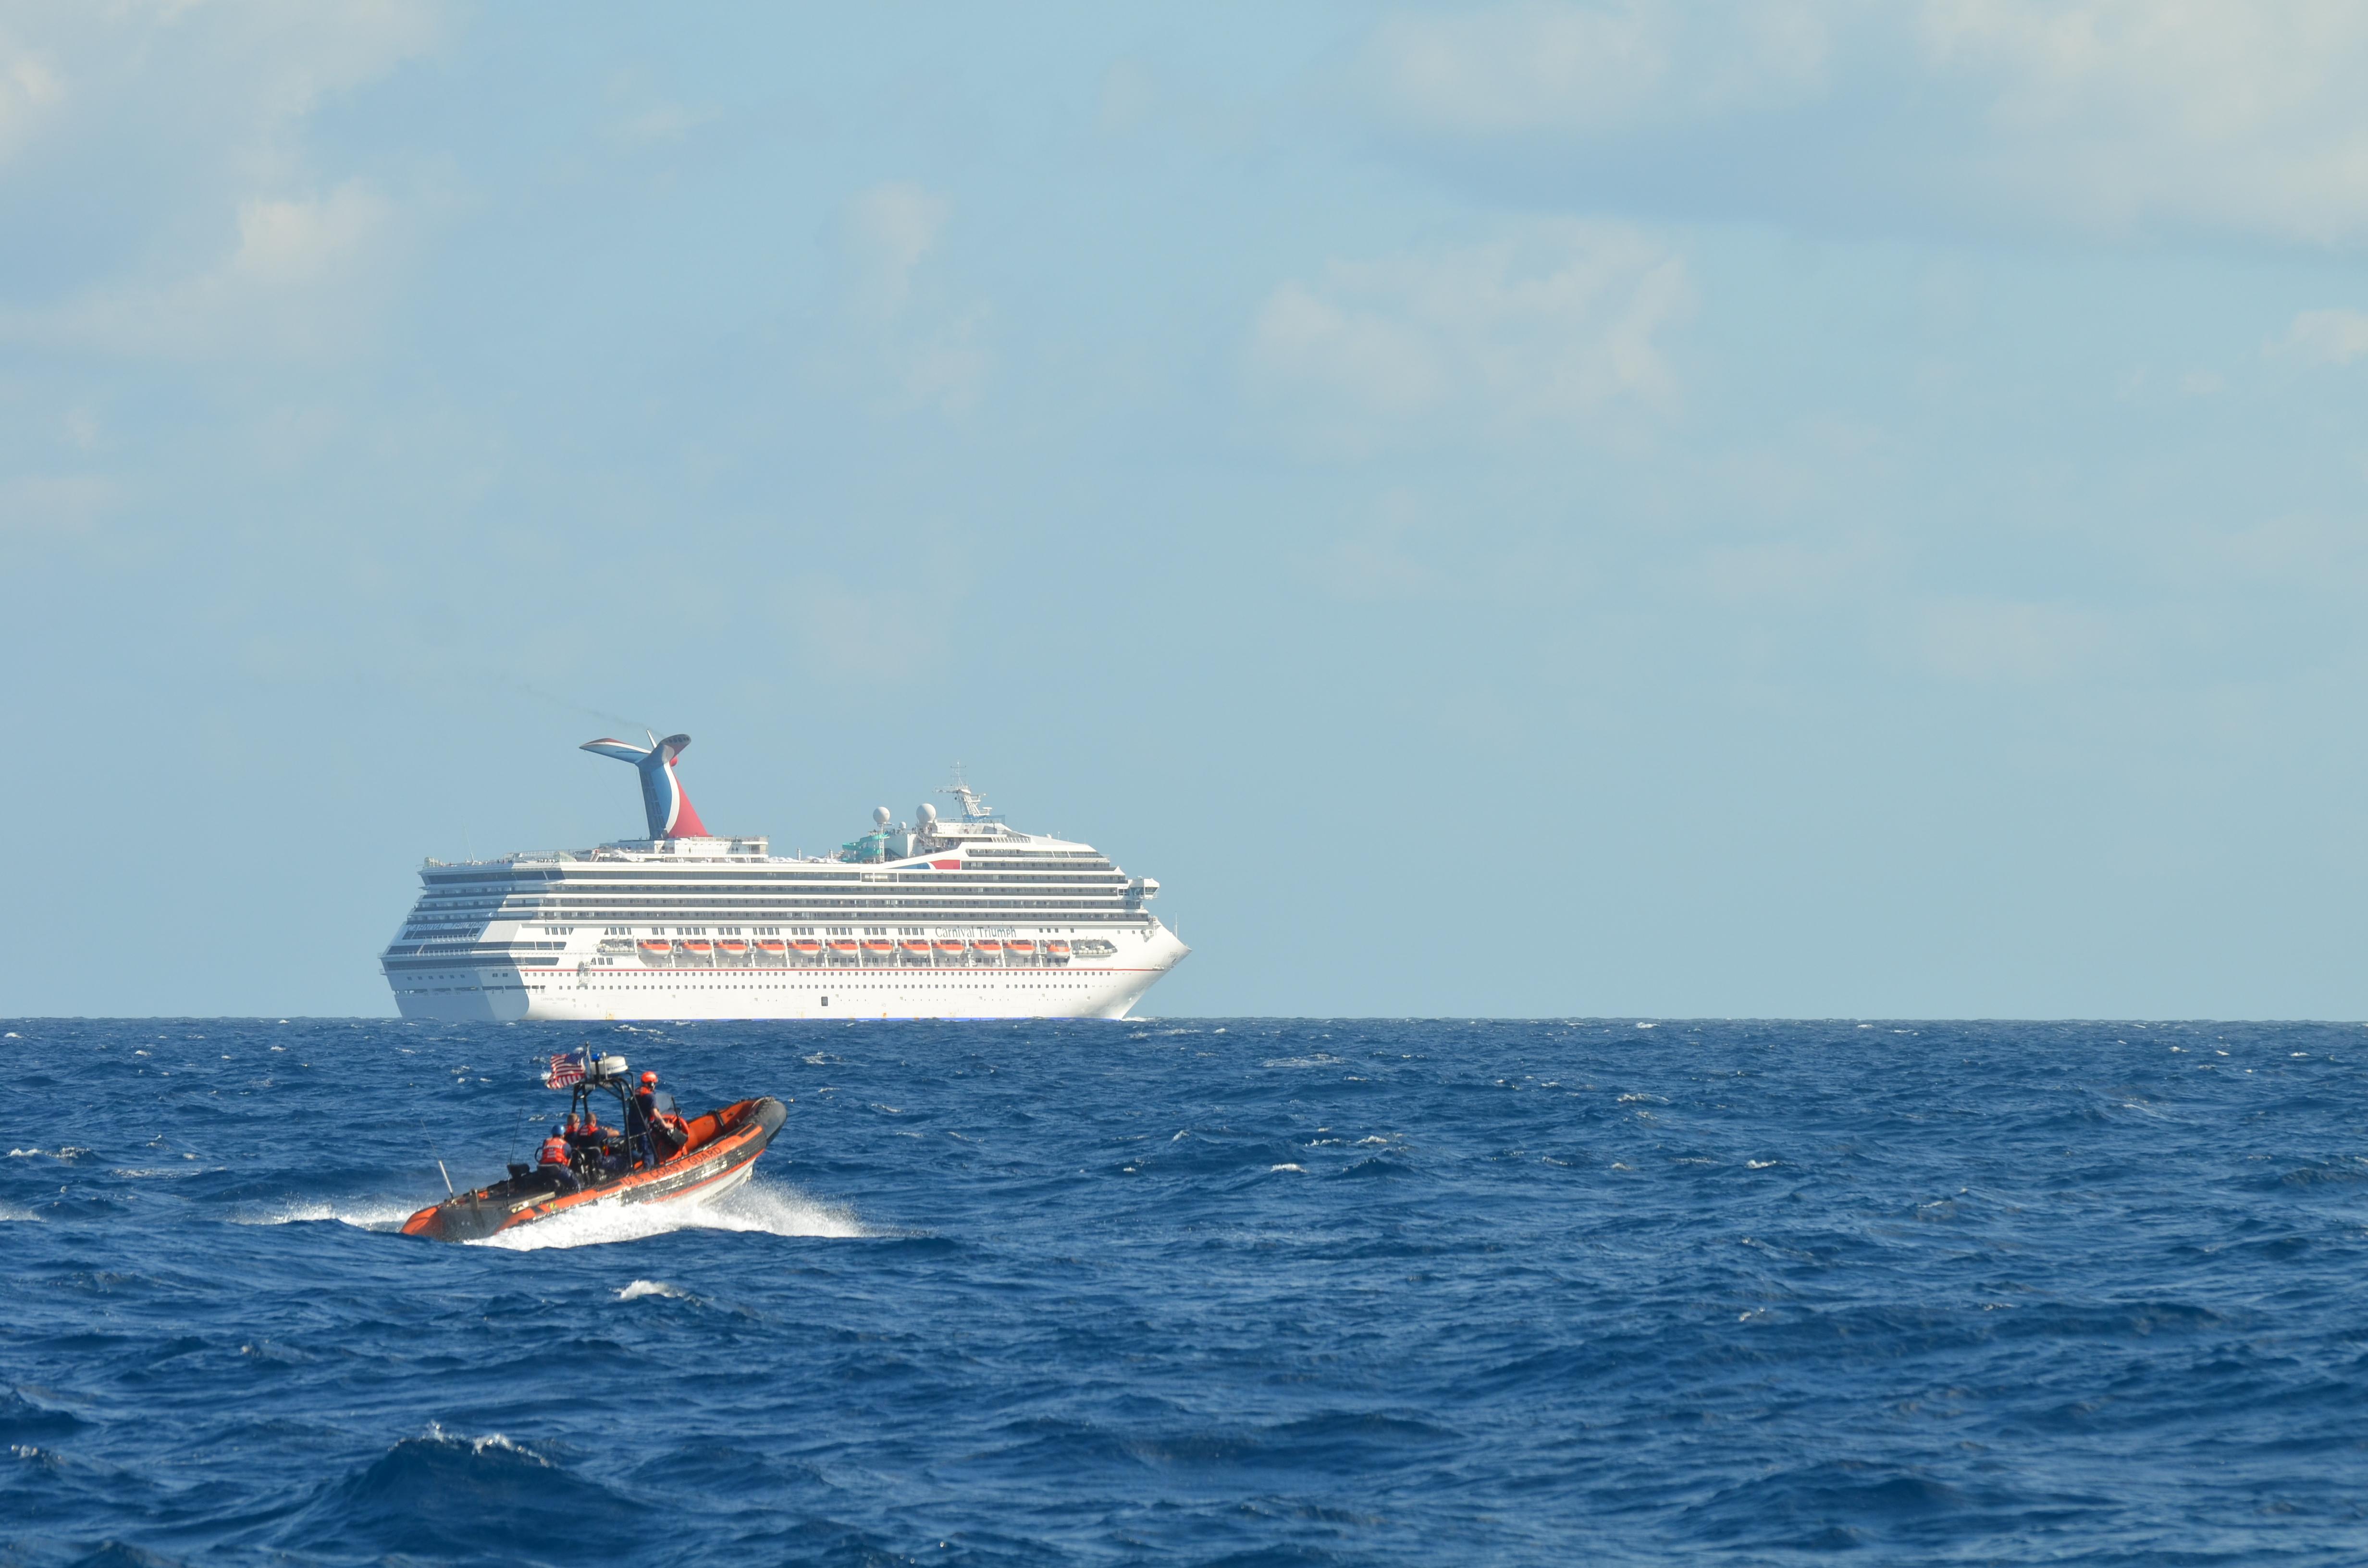 File:Coast Guard escorts disabled cruise ship (Image 3 of 4) (8471369400